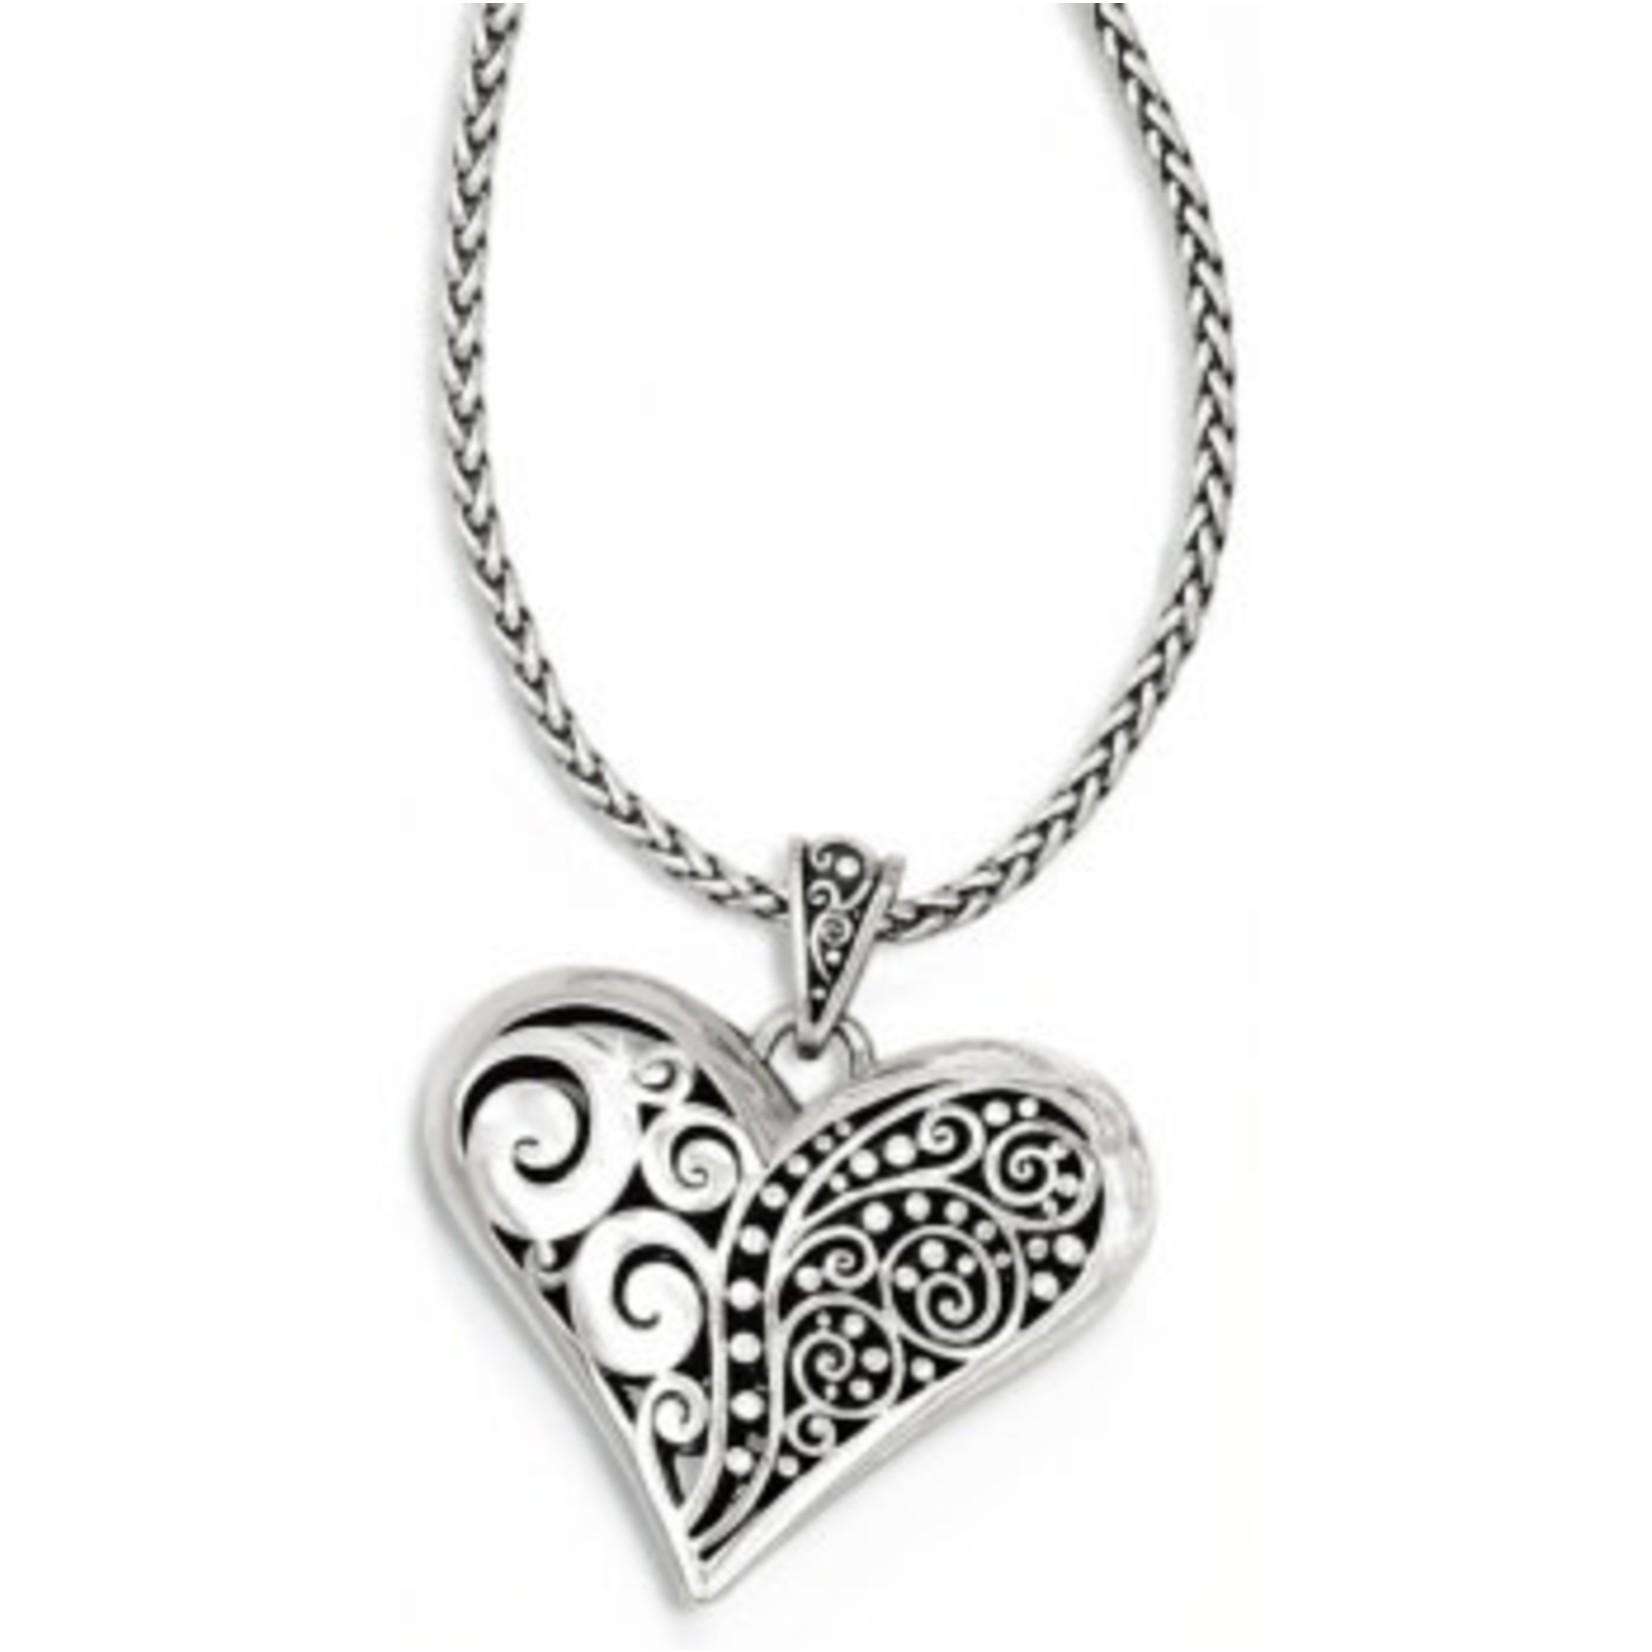 Brighton Love Affair Necklace silver